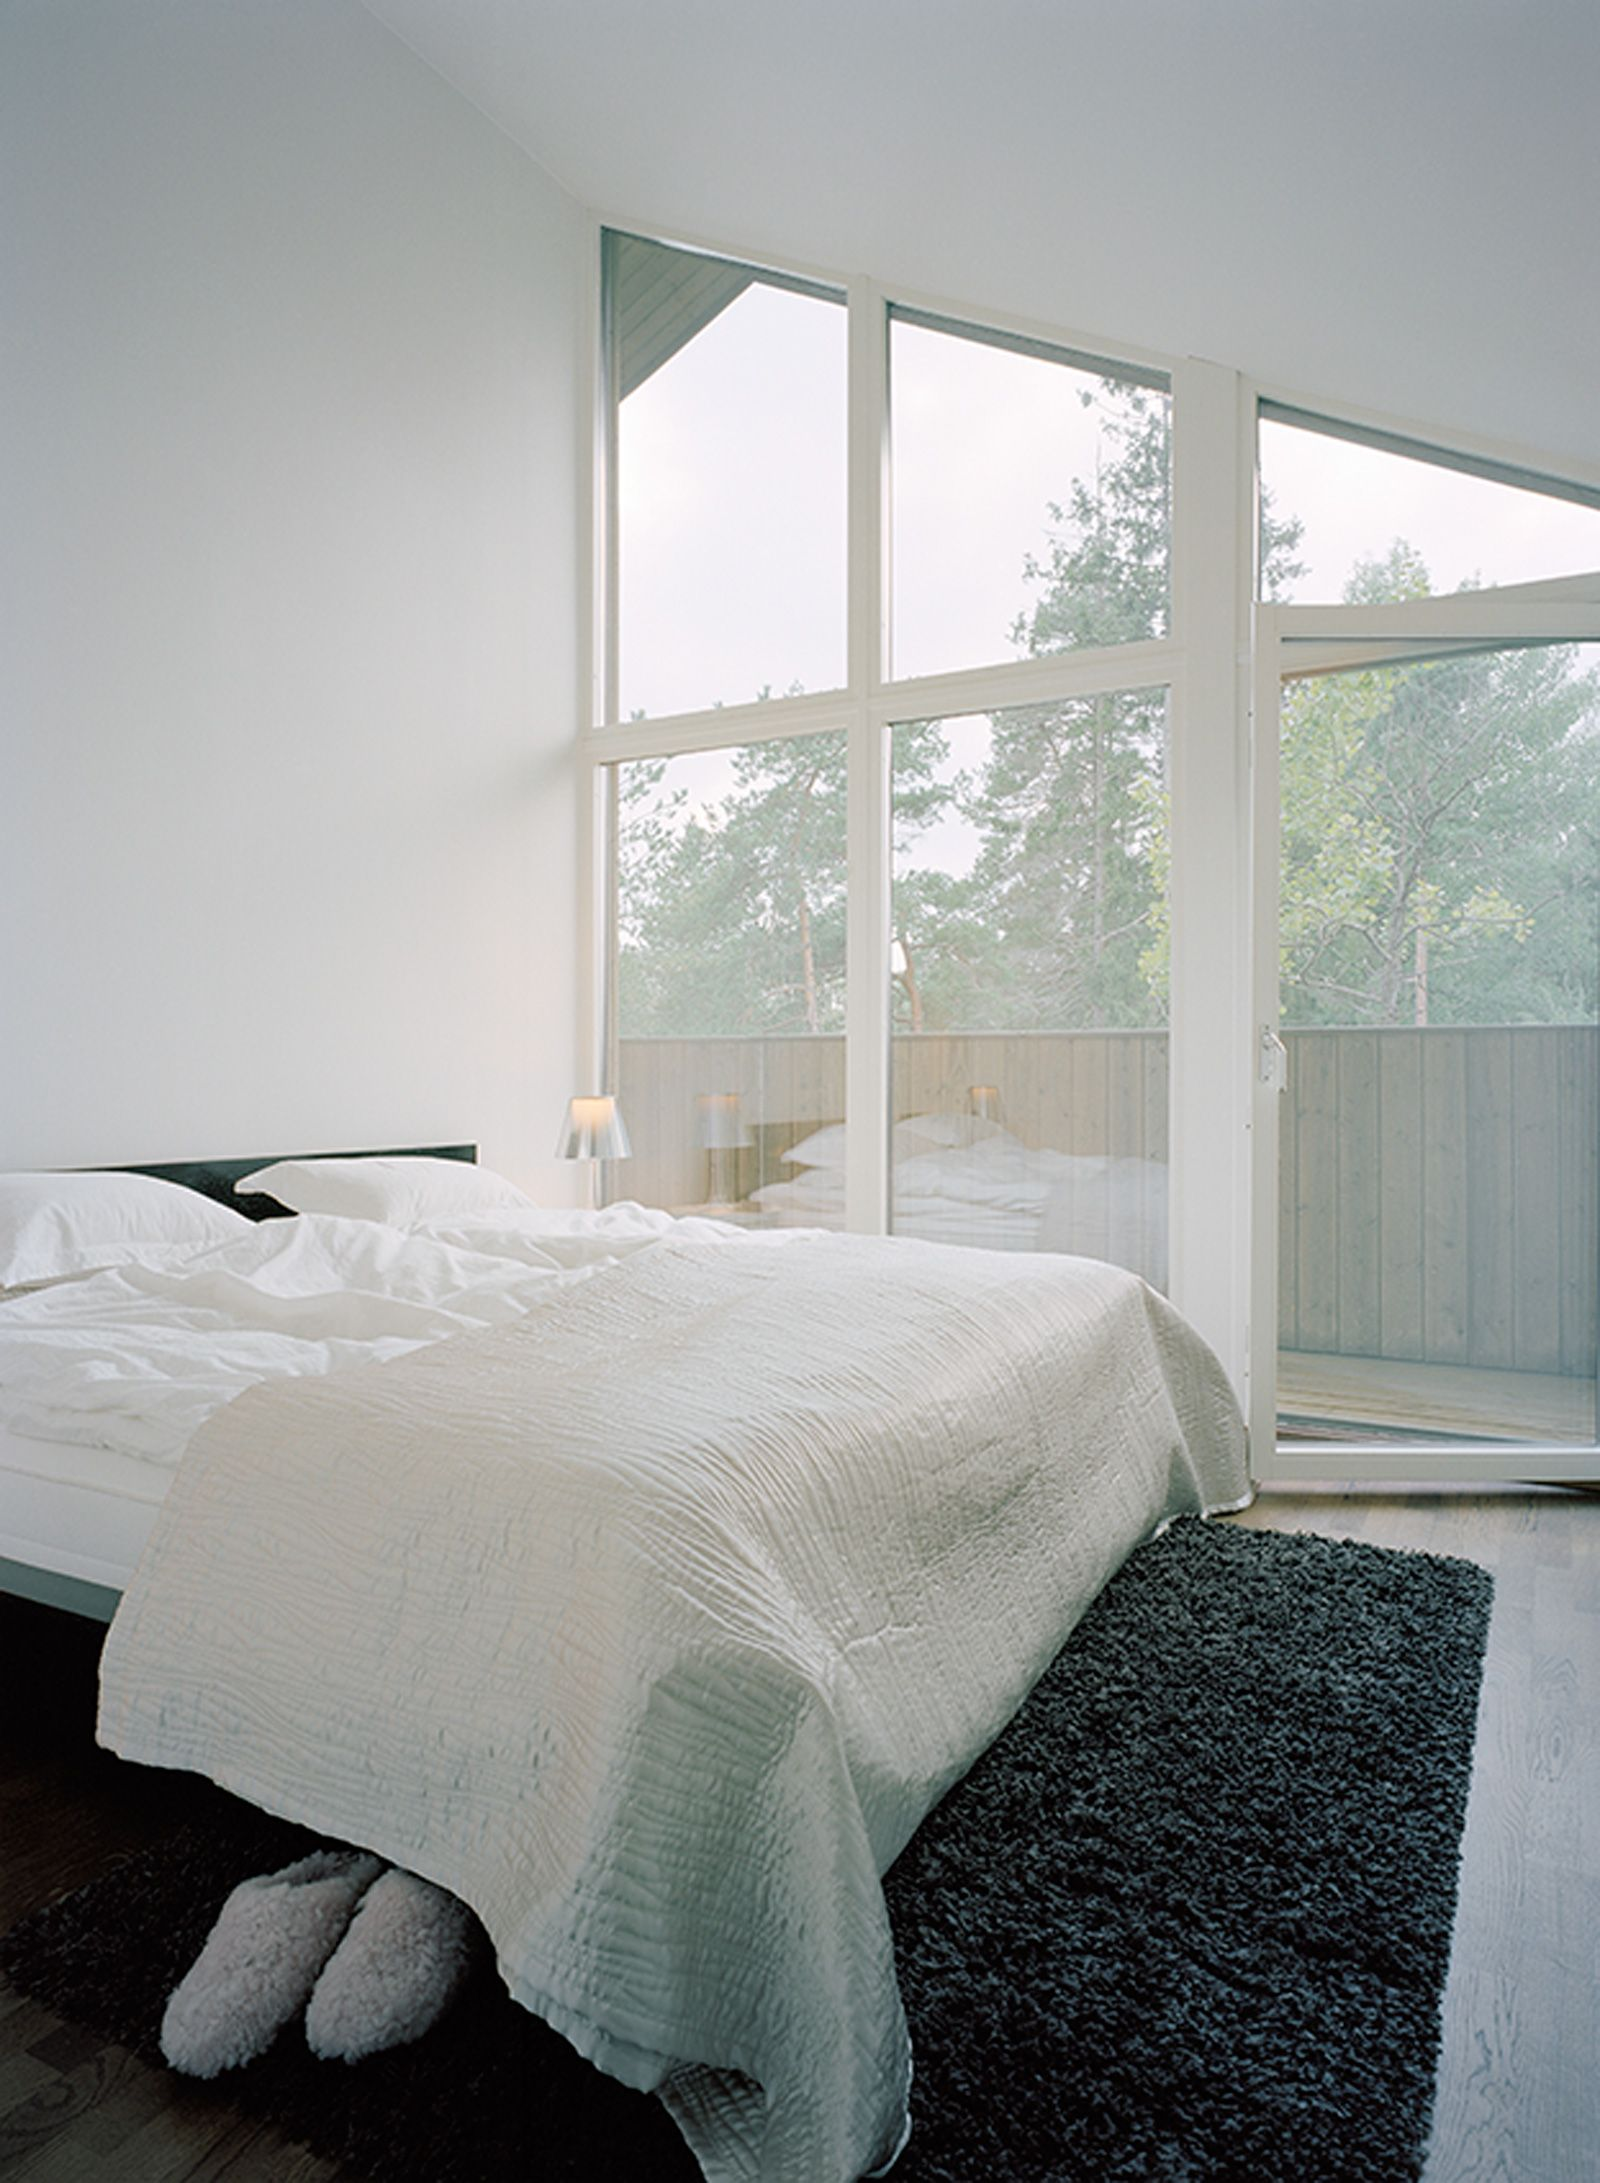 ideas home pinterest bedroom furniture bed room cheap decorating living minimalist minimal